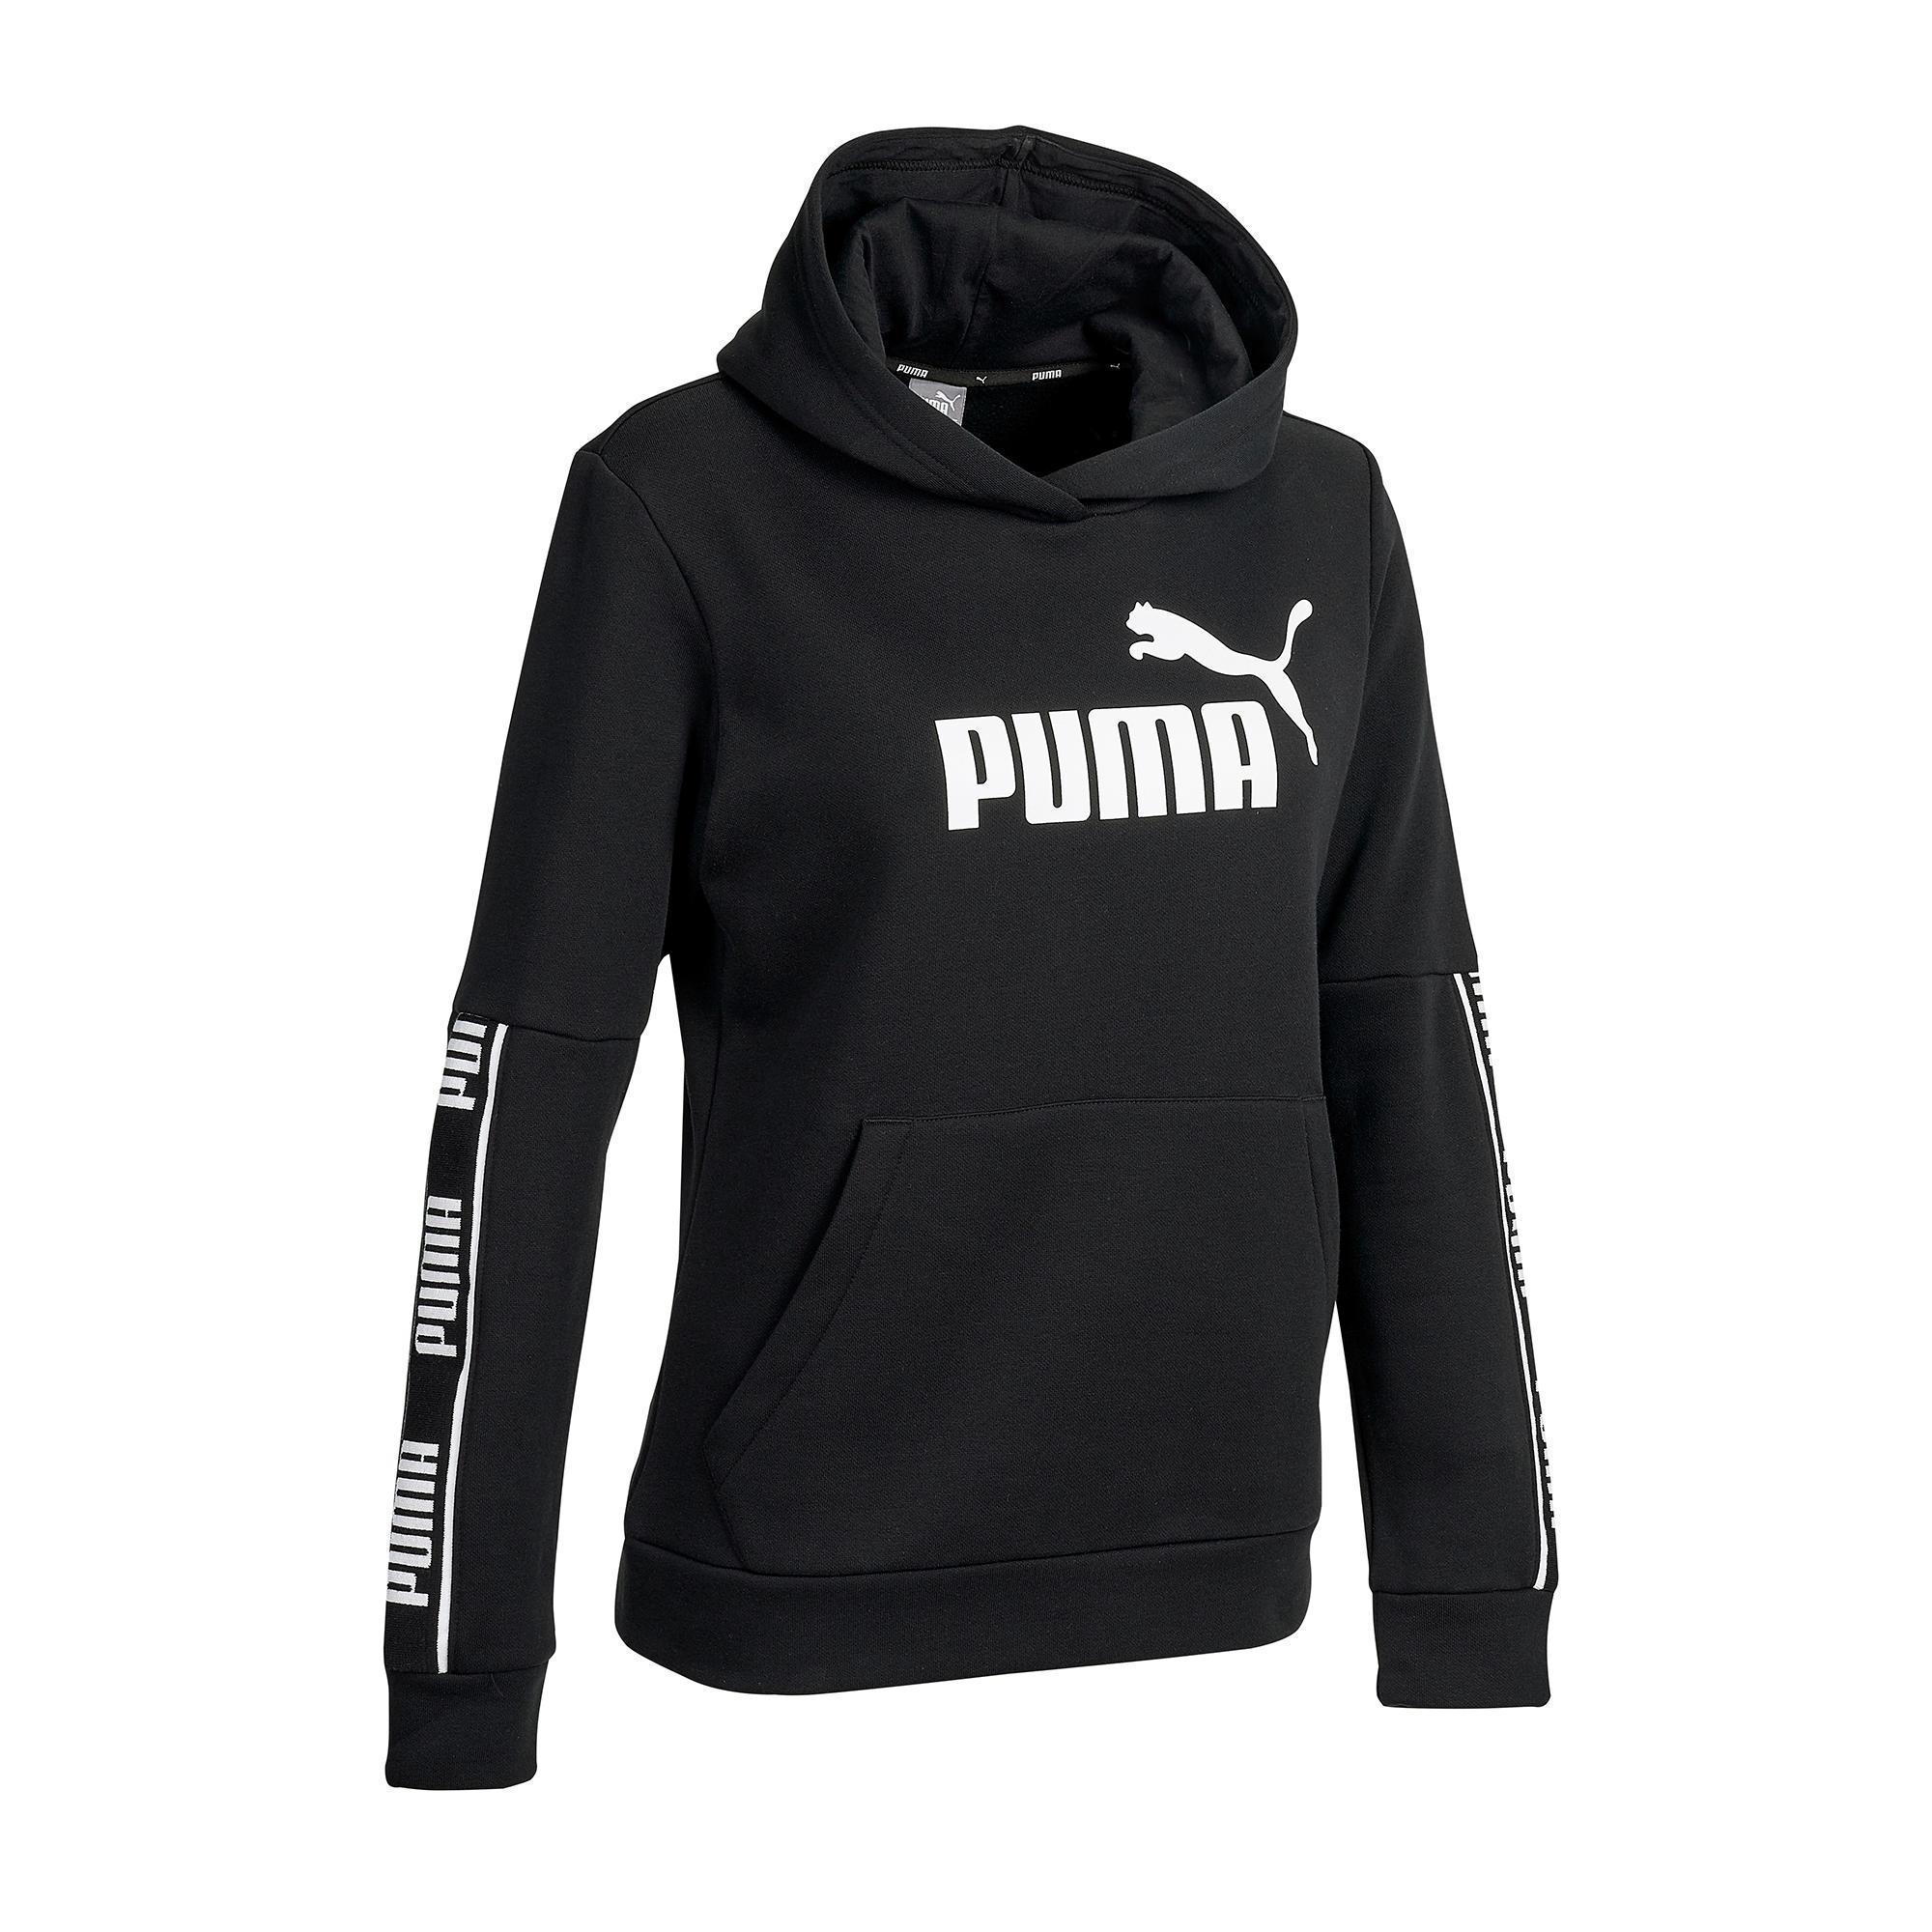 Sweat puma femme noir puma